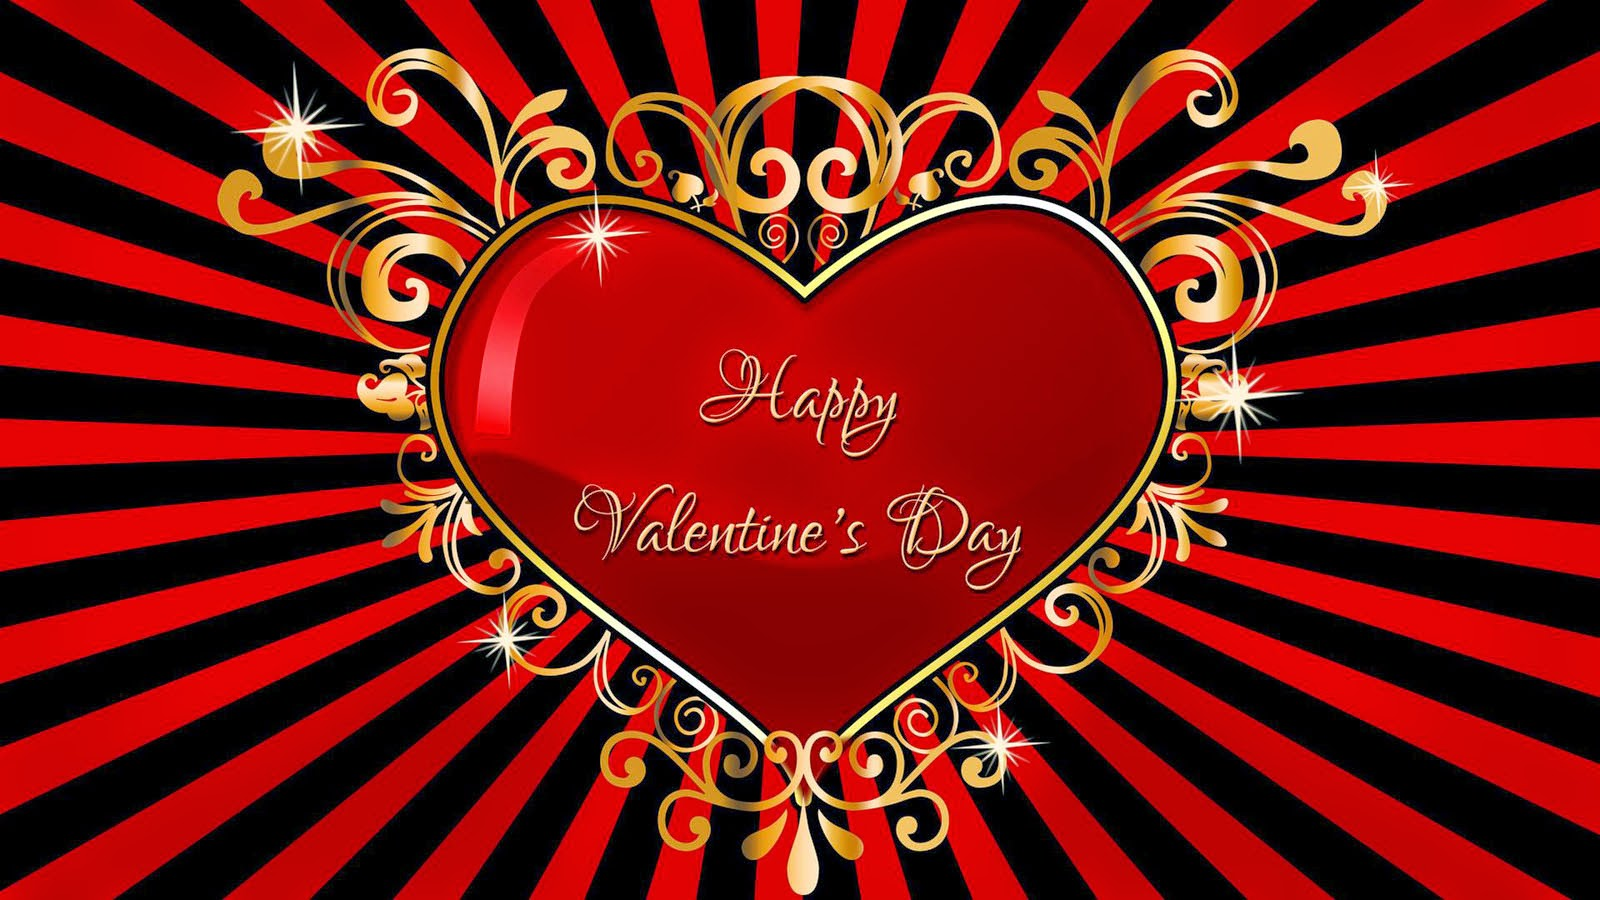 valentine day wallpaper screensavers background graphics - Valentines Day Screensavers